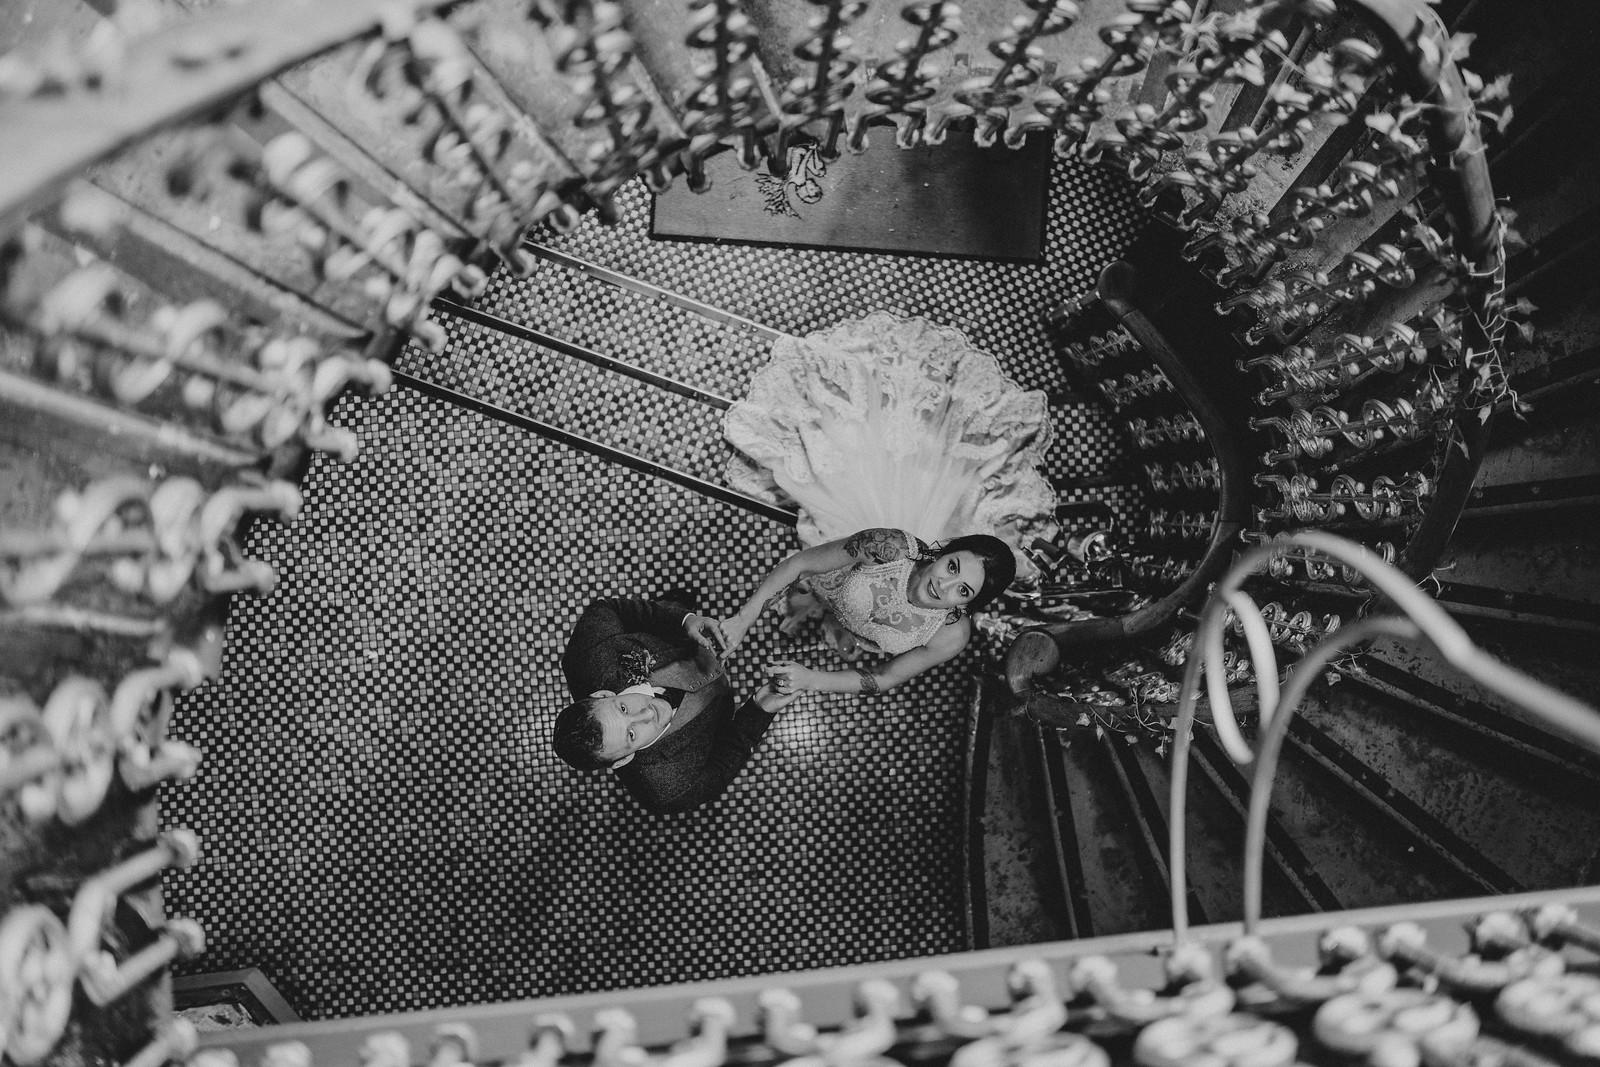 Bride and groom wedding photo - above shot